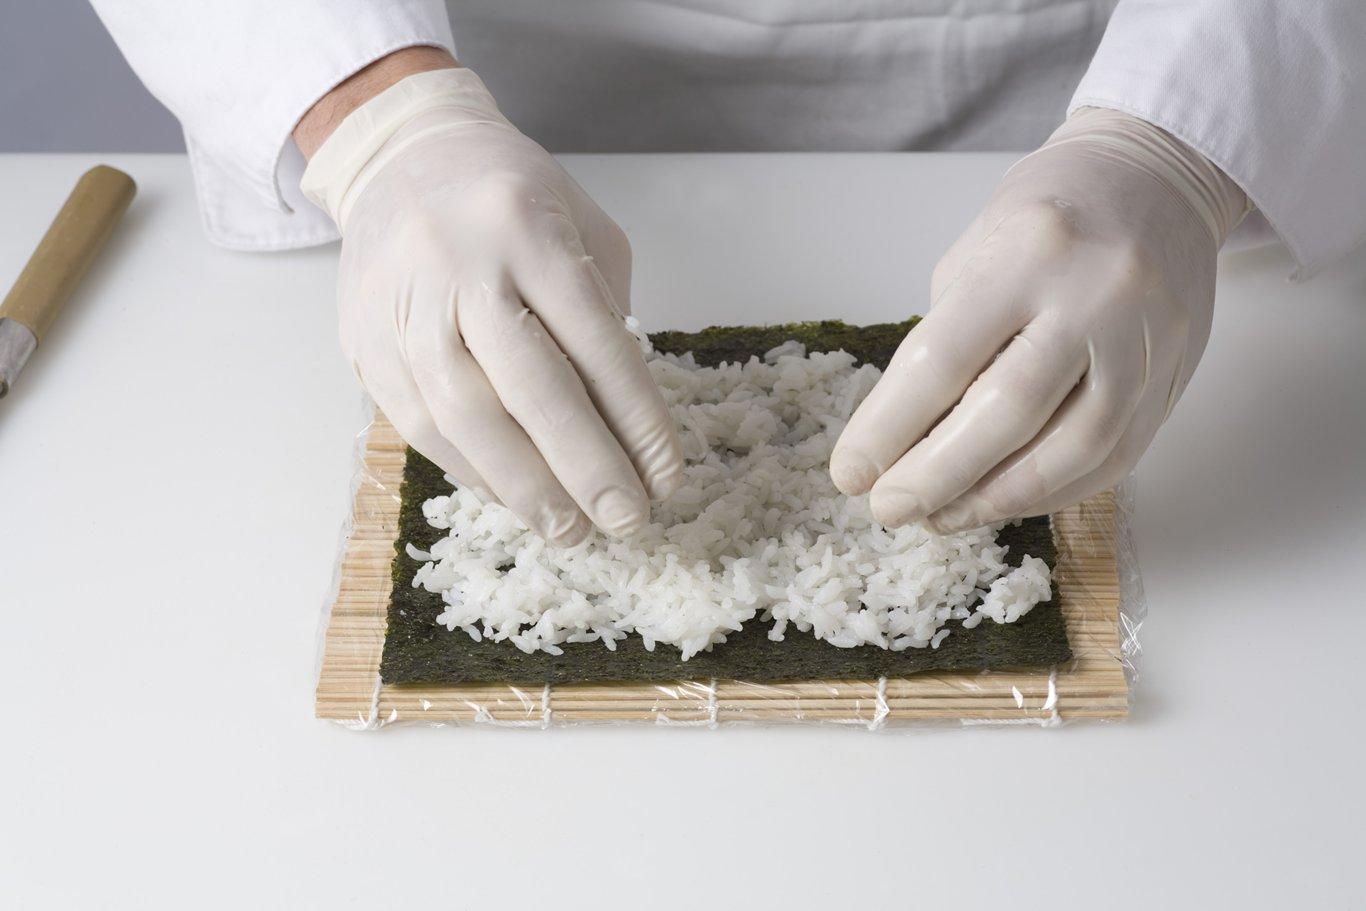 Spreading sushi rice on sheet or nori